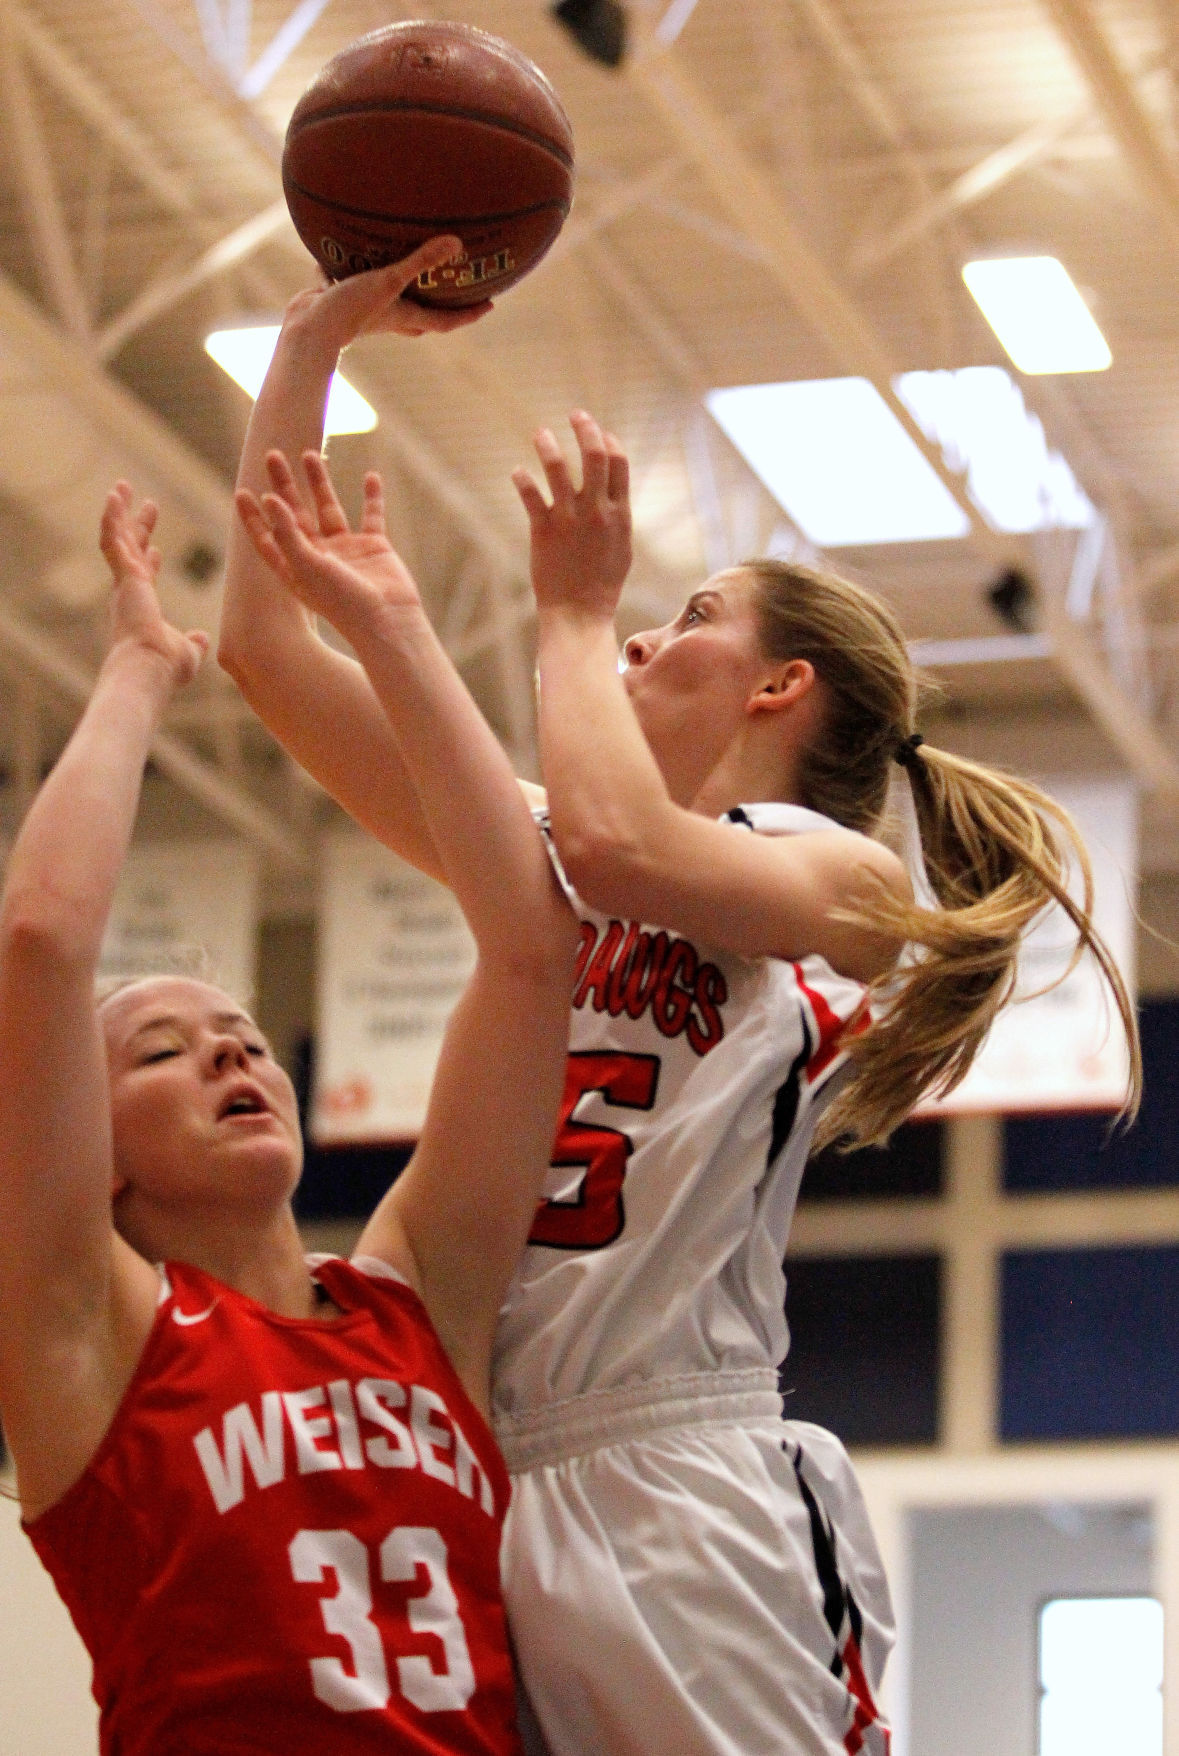 State Championship Basketball - Kimberly Vs. Weiser